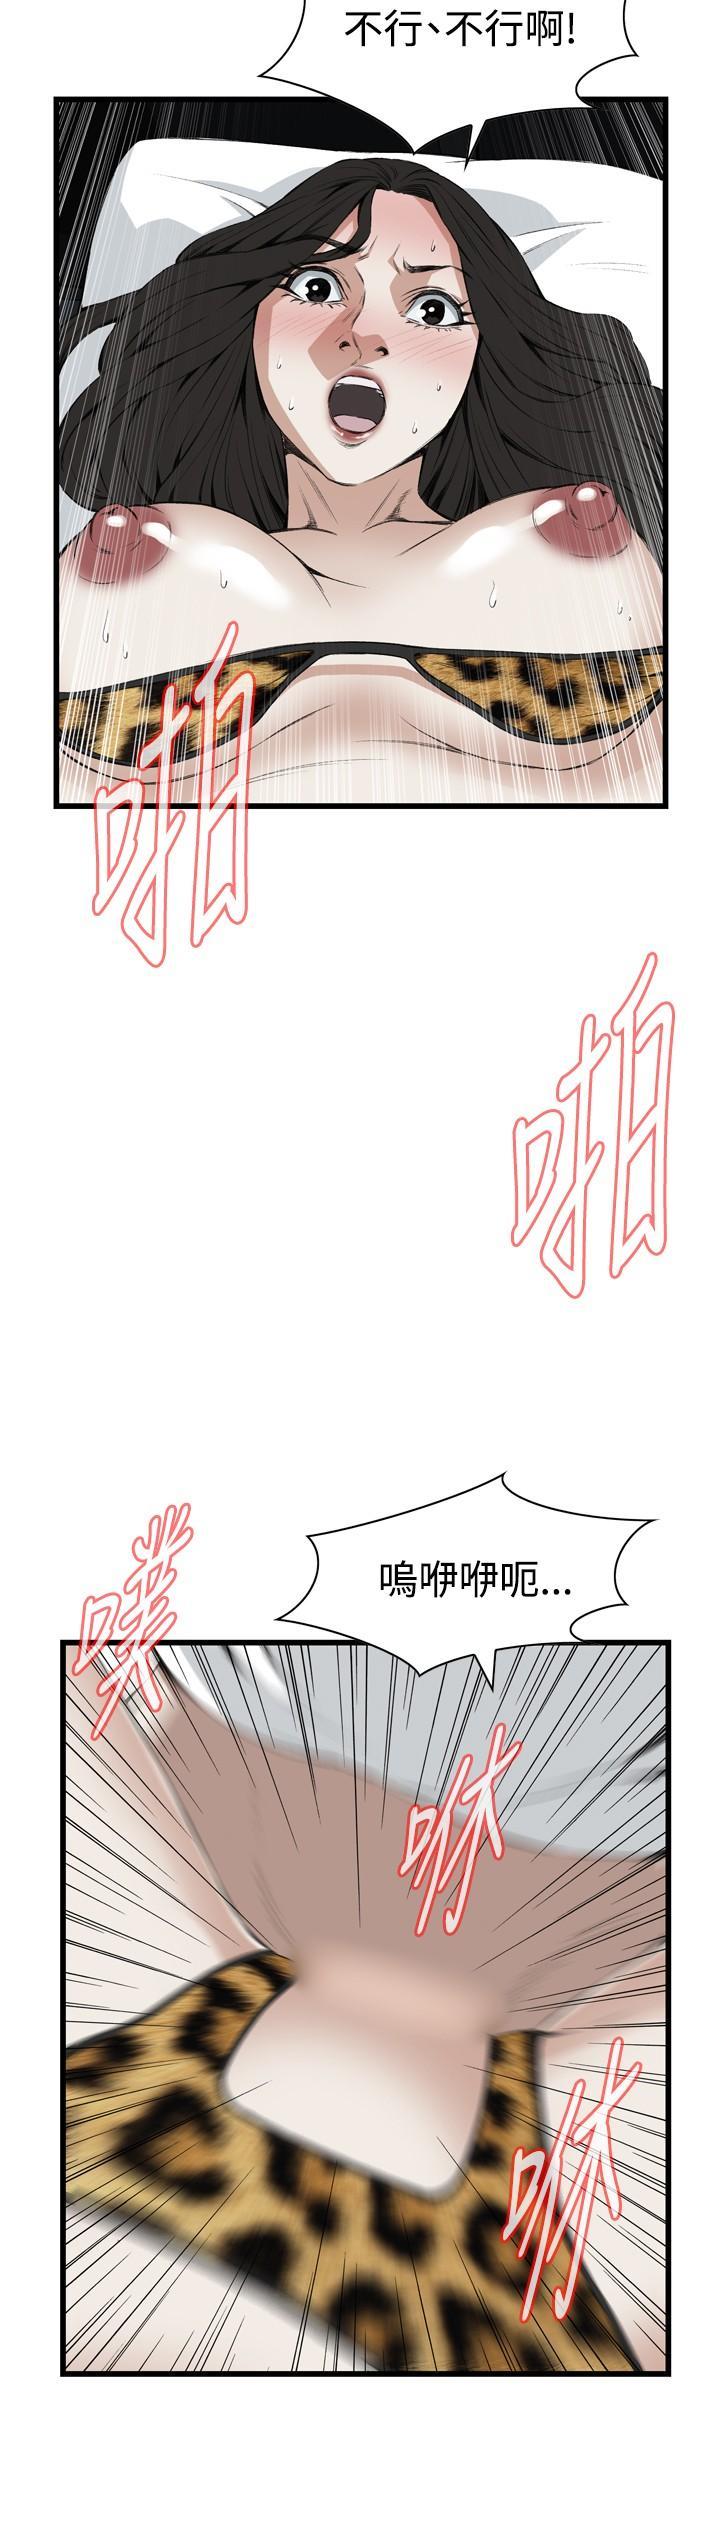 Take a Peek 偷窥 Ch.39~60 [Chinese]中文 477